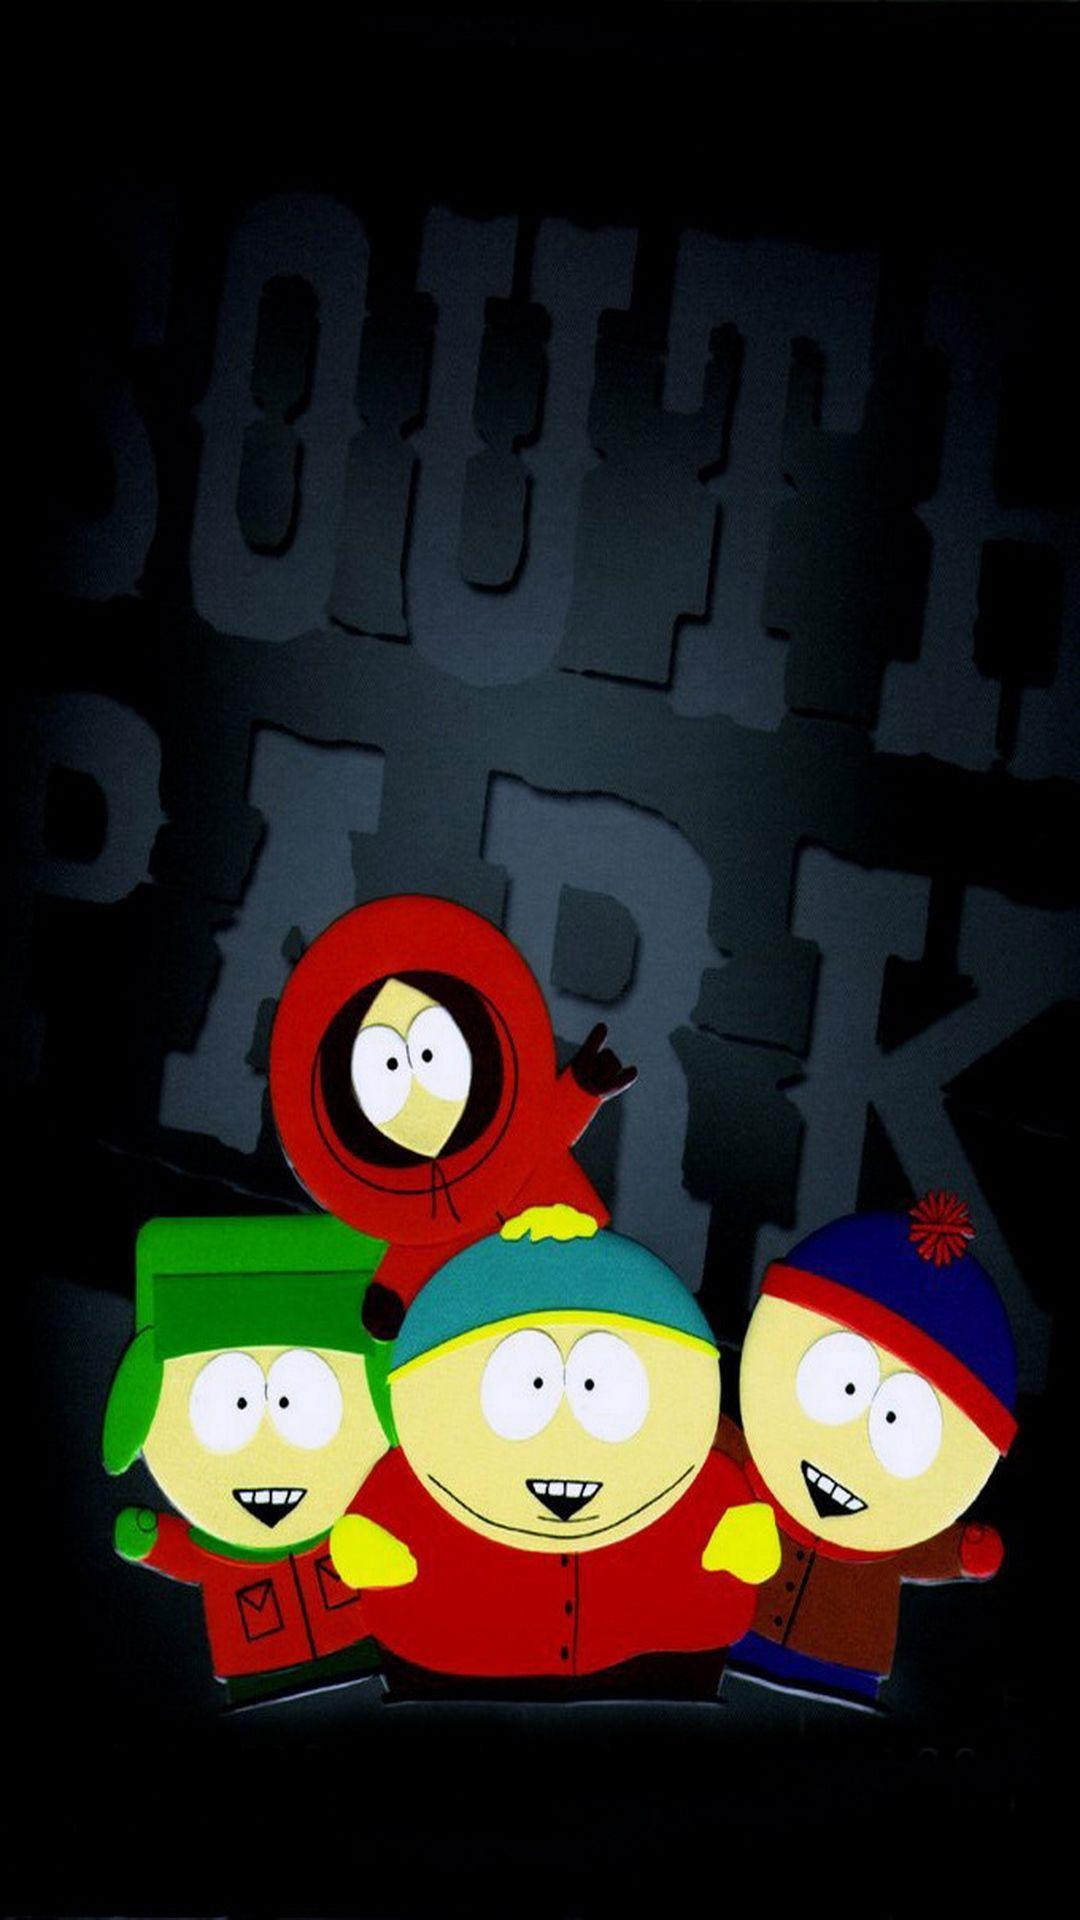 Beste 47 South Park Iphone Hintergrund Auf Hipwallpaper Im Zusammenhang Mit The Awesome S Best 47 S South Park Art Activities For Kids Cartoon Wallpaper